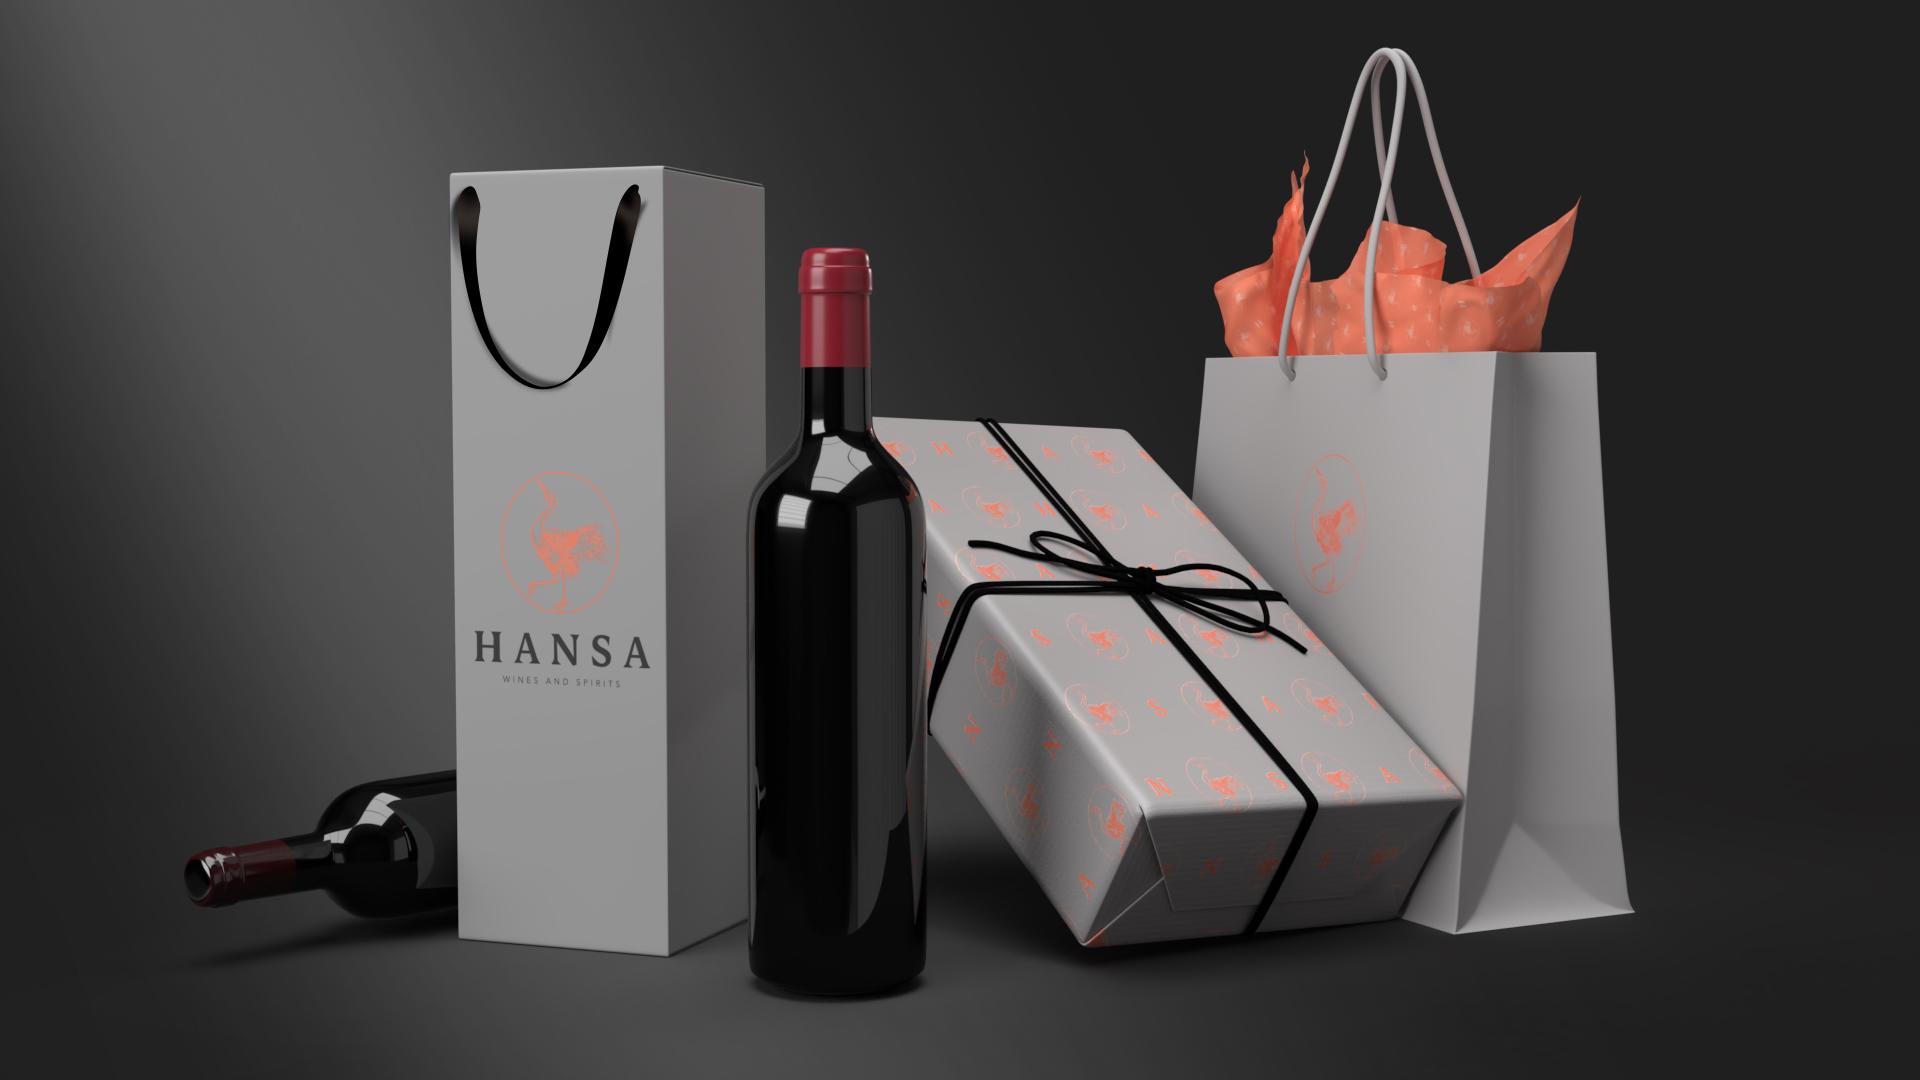 hansa rebranding and packaging design